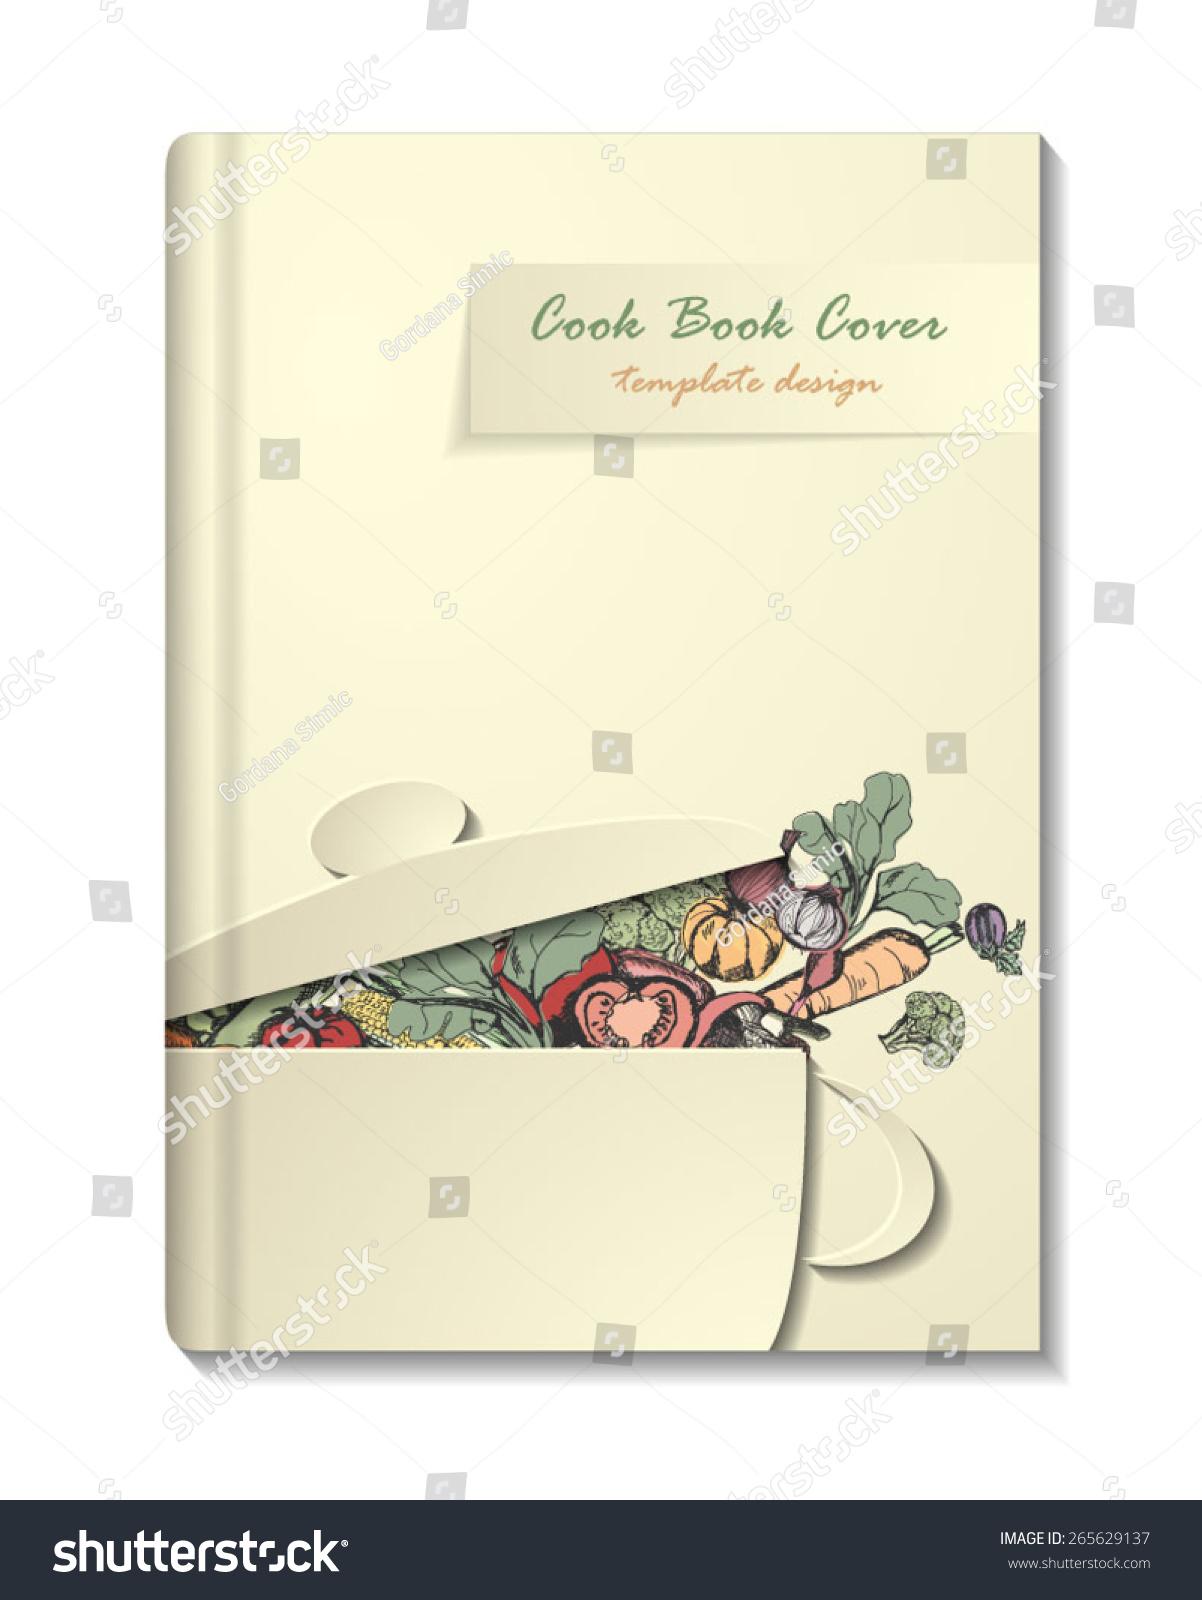 Cookbook Cover Vector ~ Cook book or manu cover template retro minimalistic